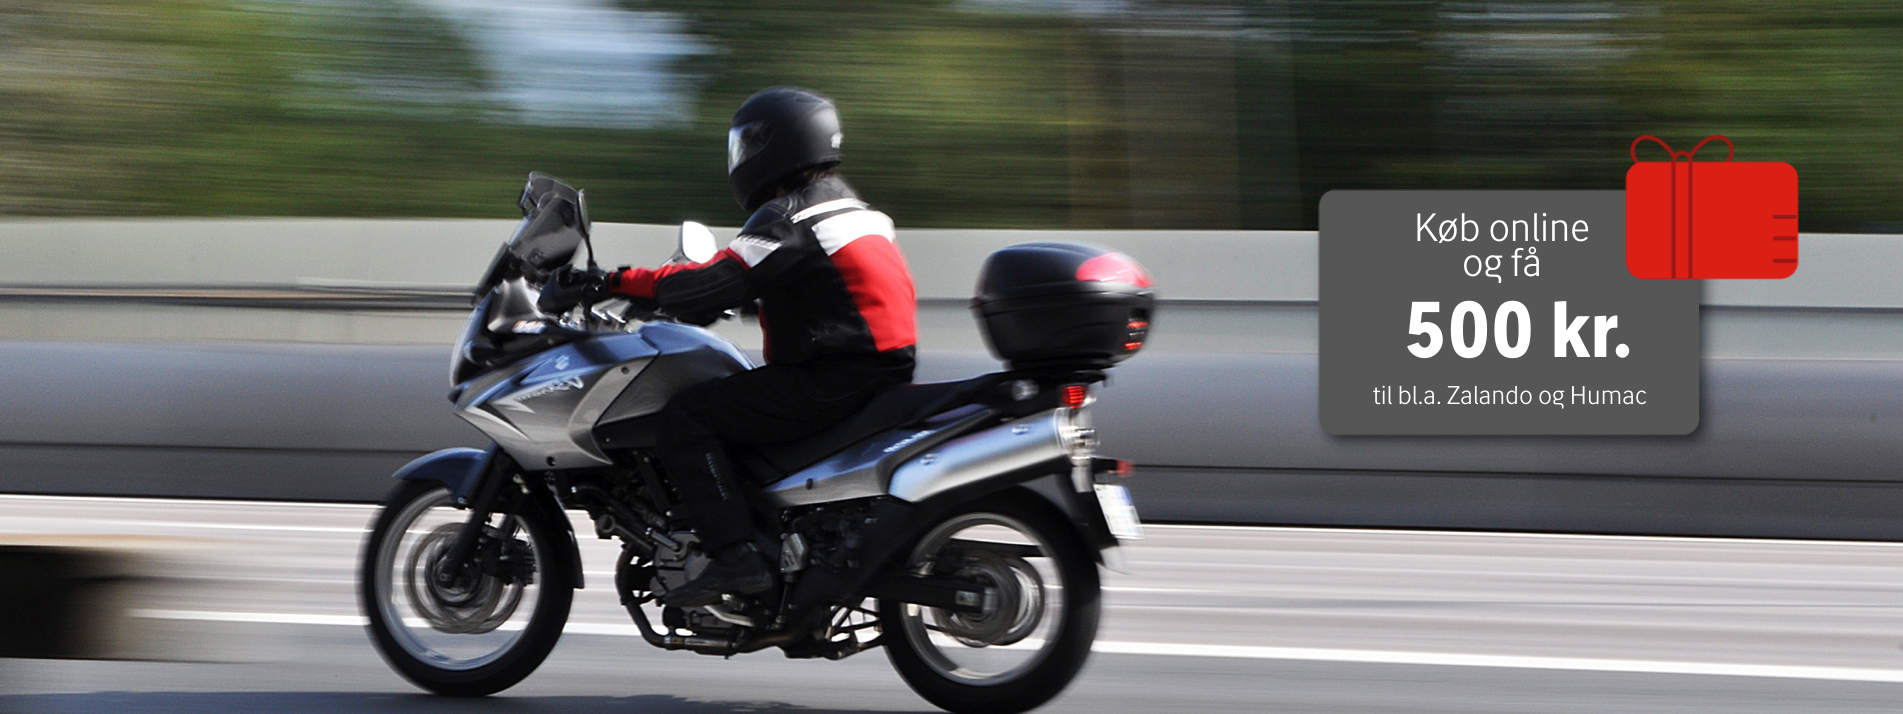 motorcykel afgift beregning